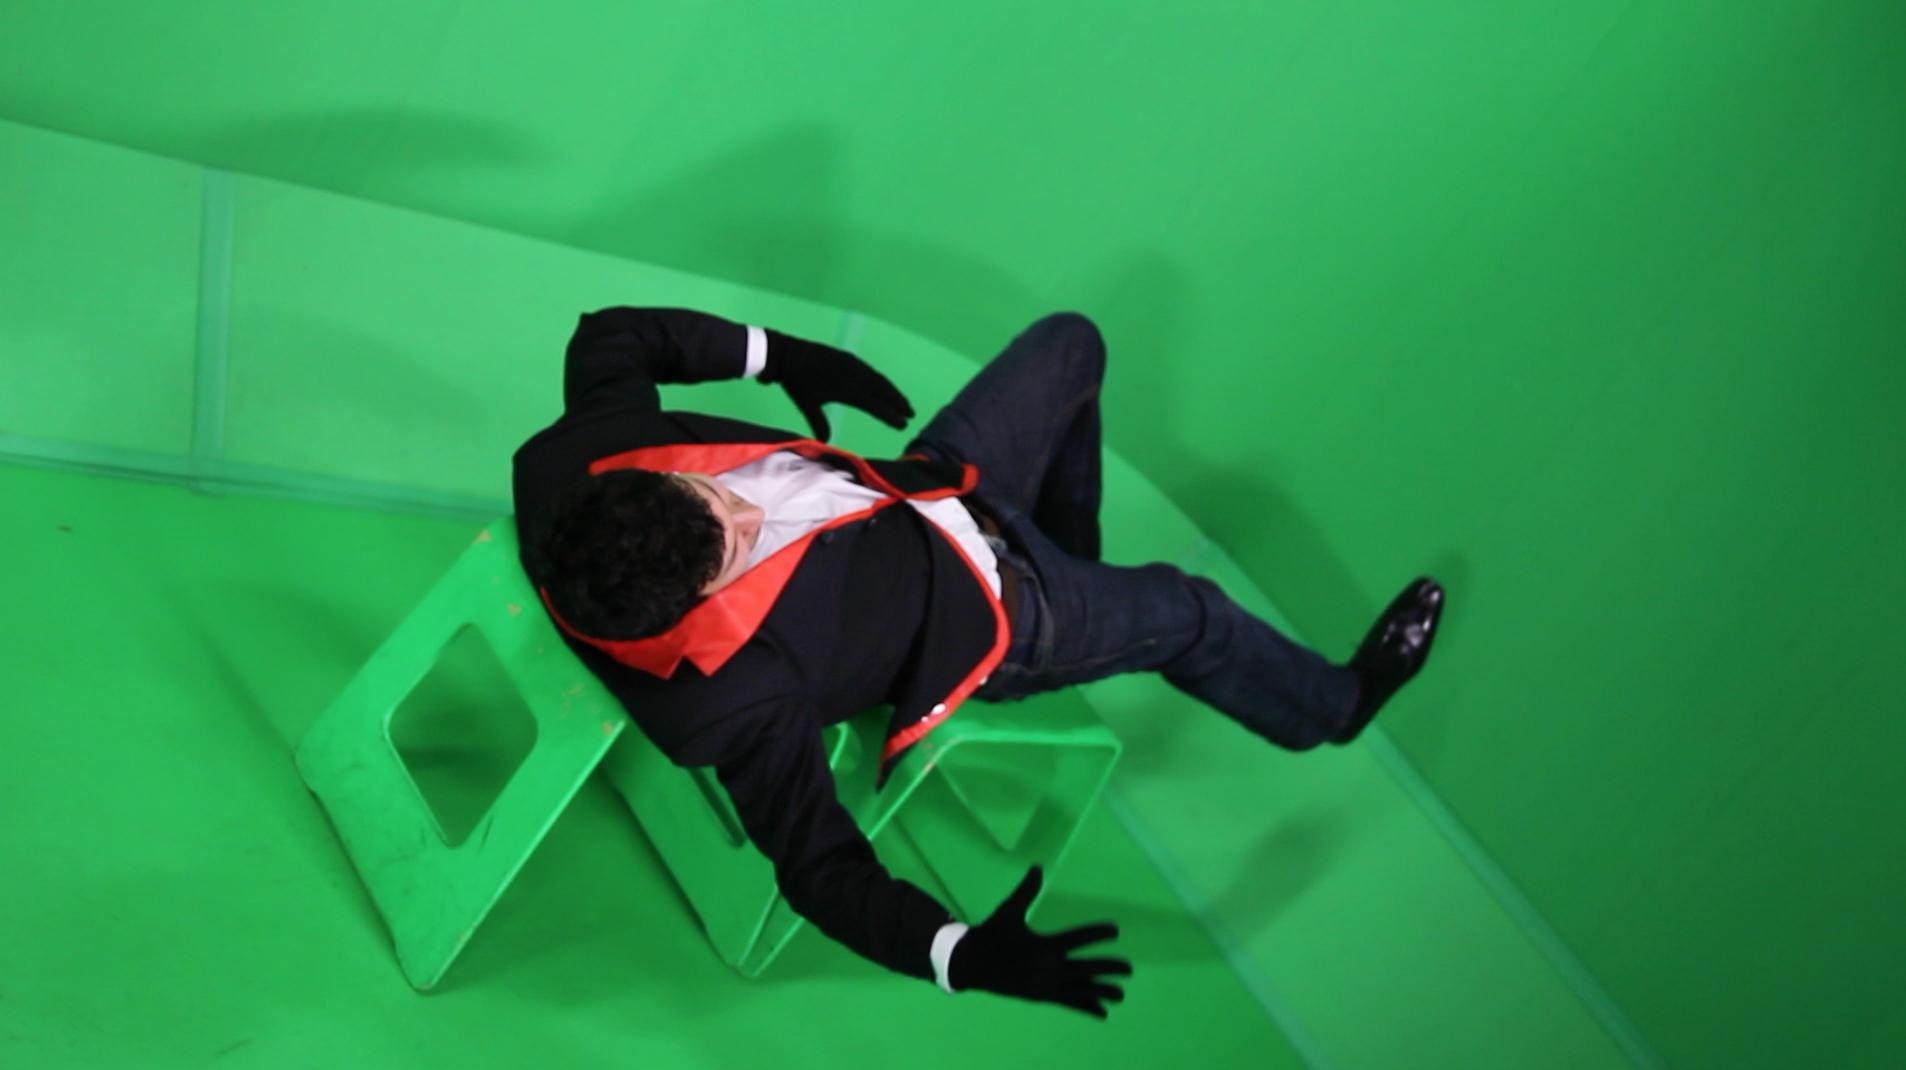 Green screen shoot footage